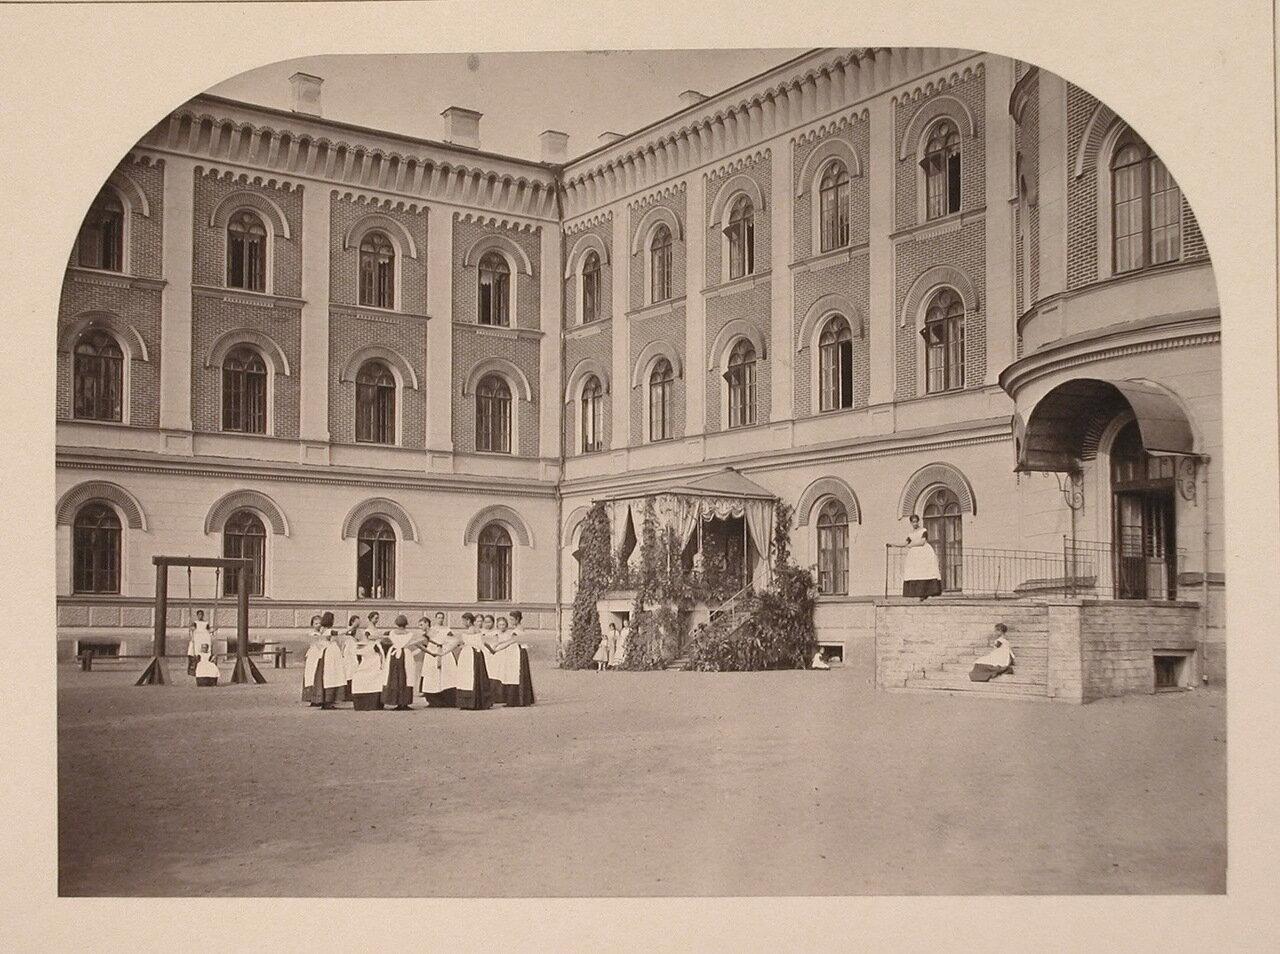 Группа воспитанниц  во дворе института во время игр